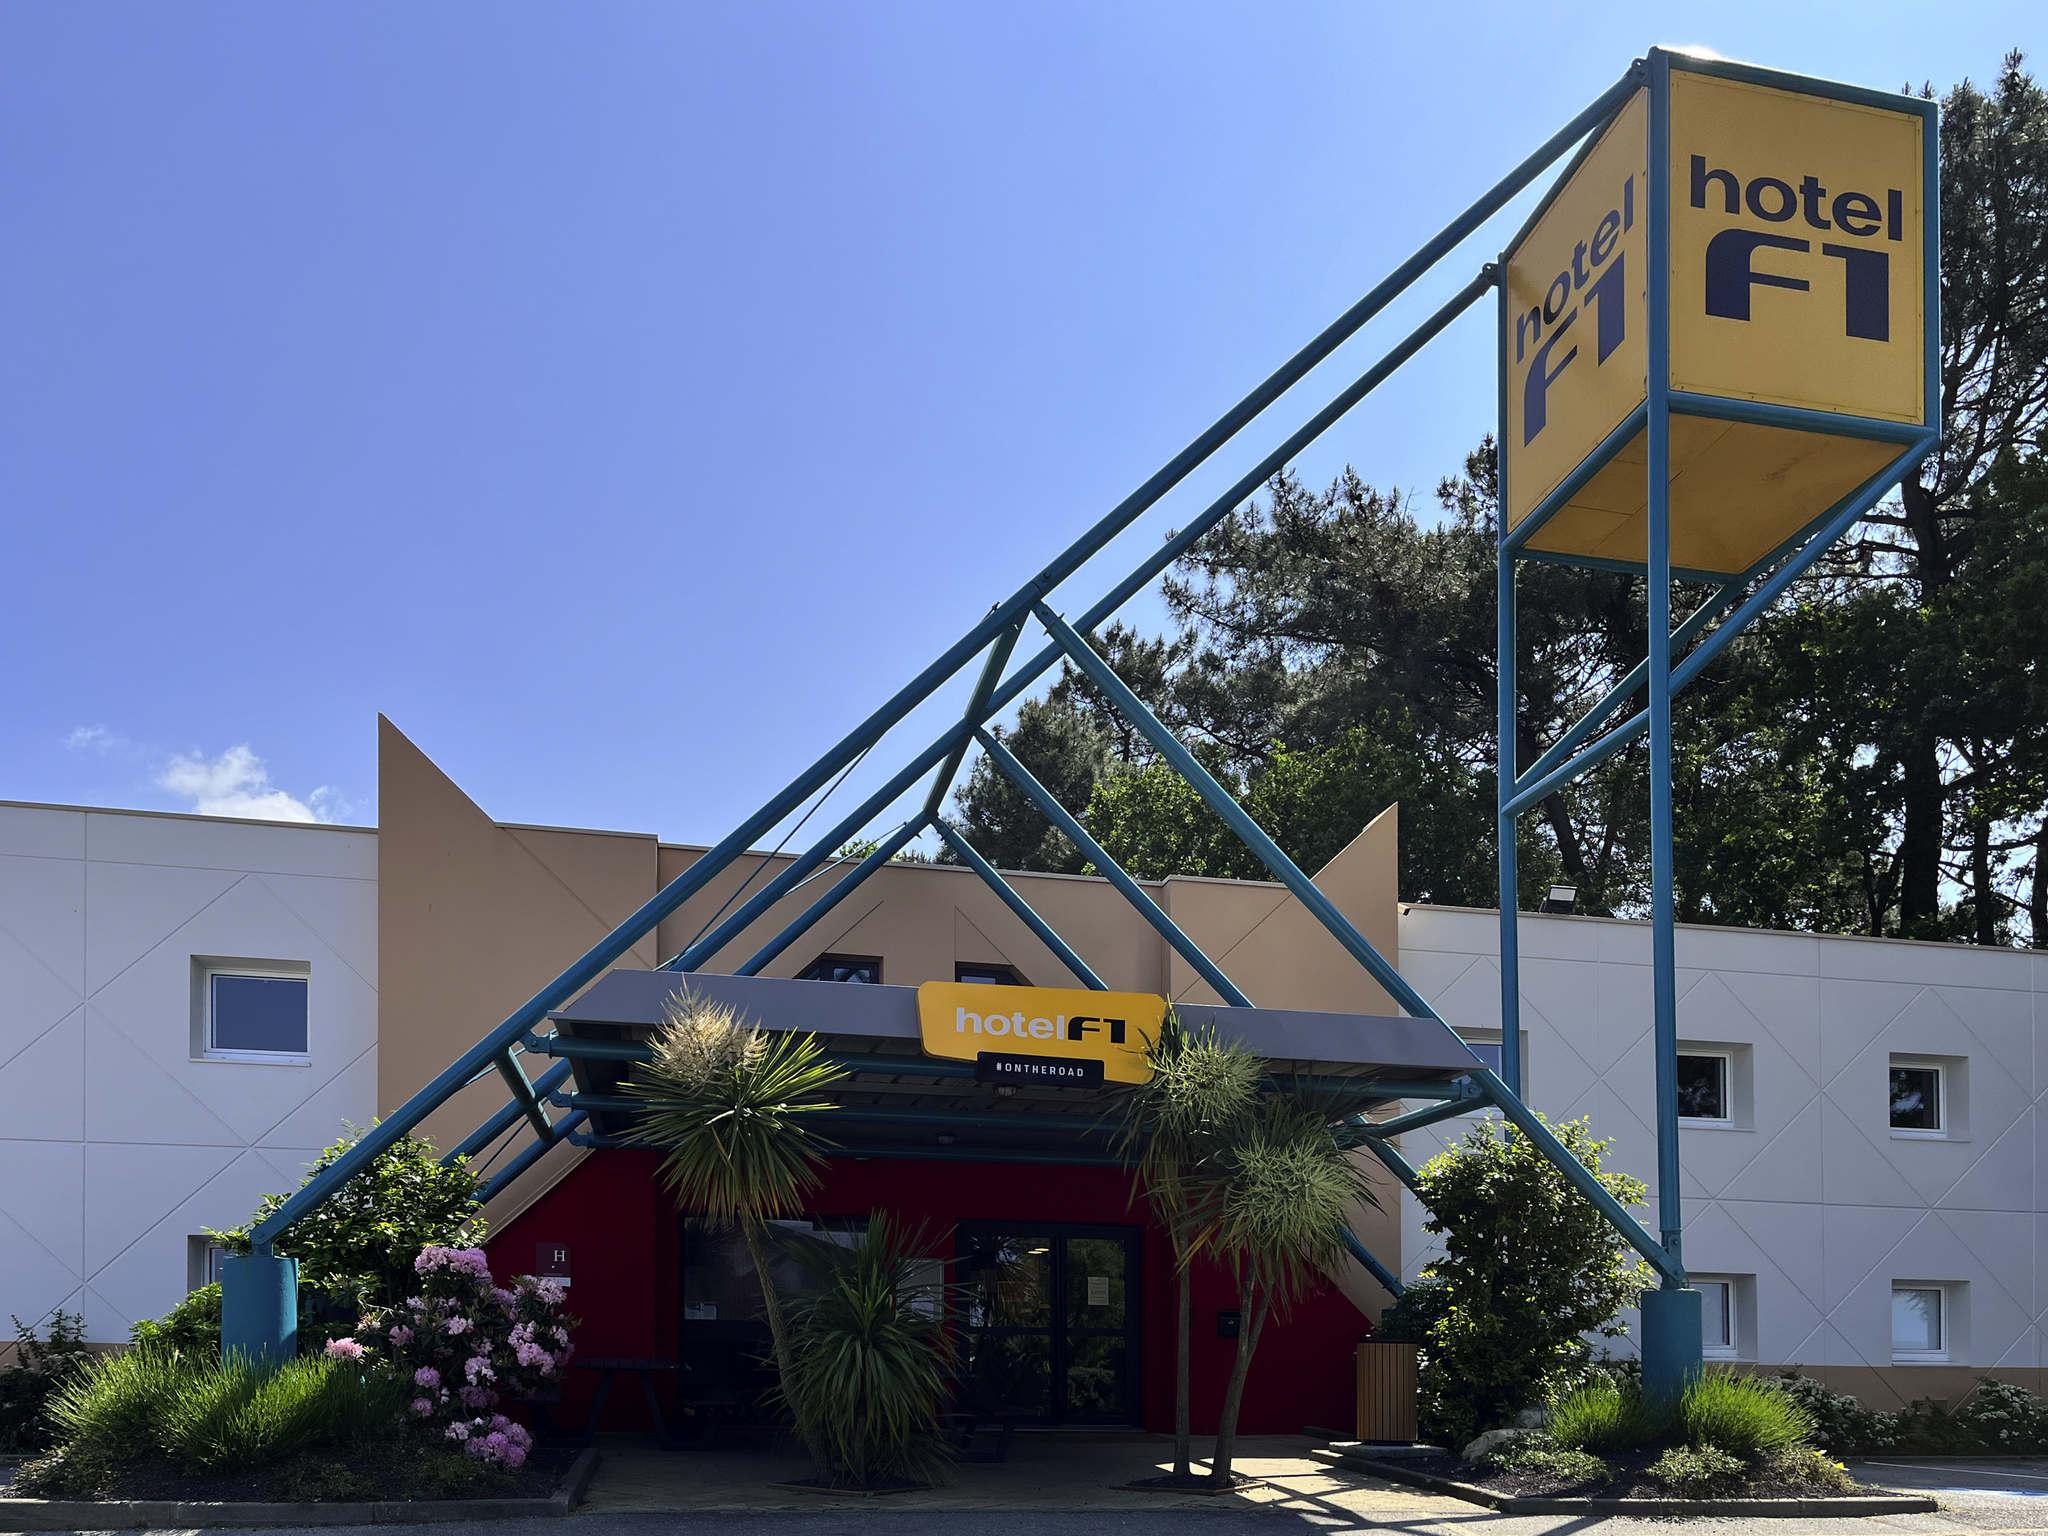 Hotel In CAUDAN HotelF Lorient - Lit formule 1 pas cher